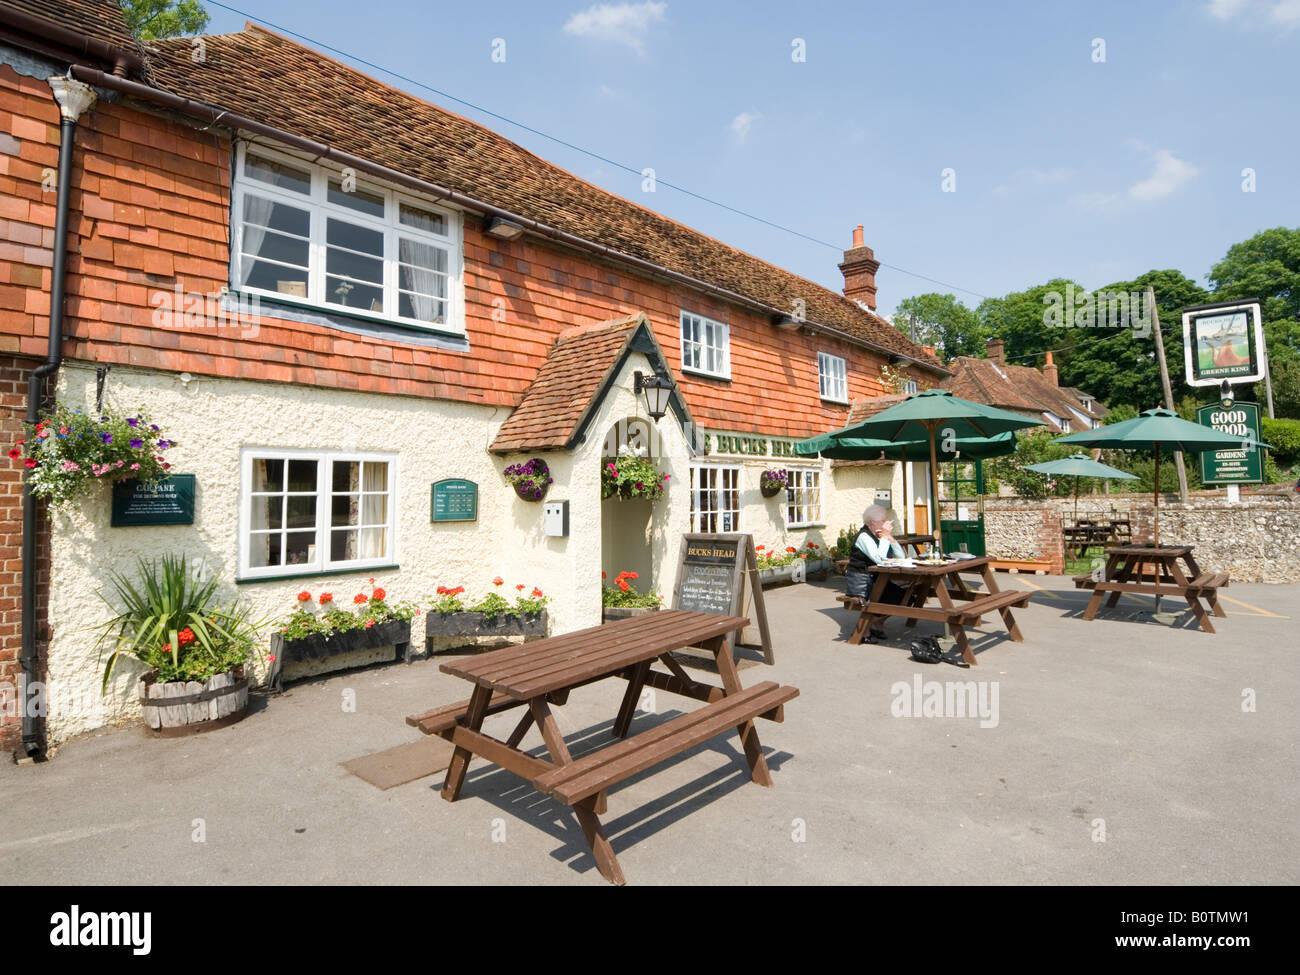 Bucks Head Village Pub Meonstoke Hampshire UK - Stock Image